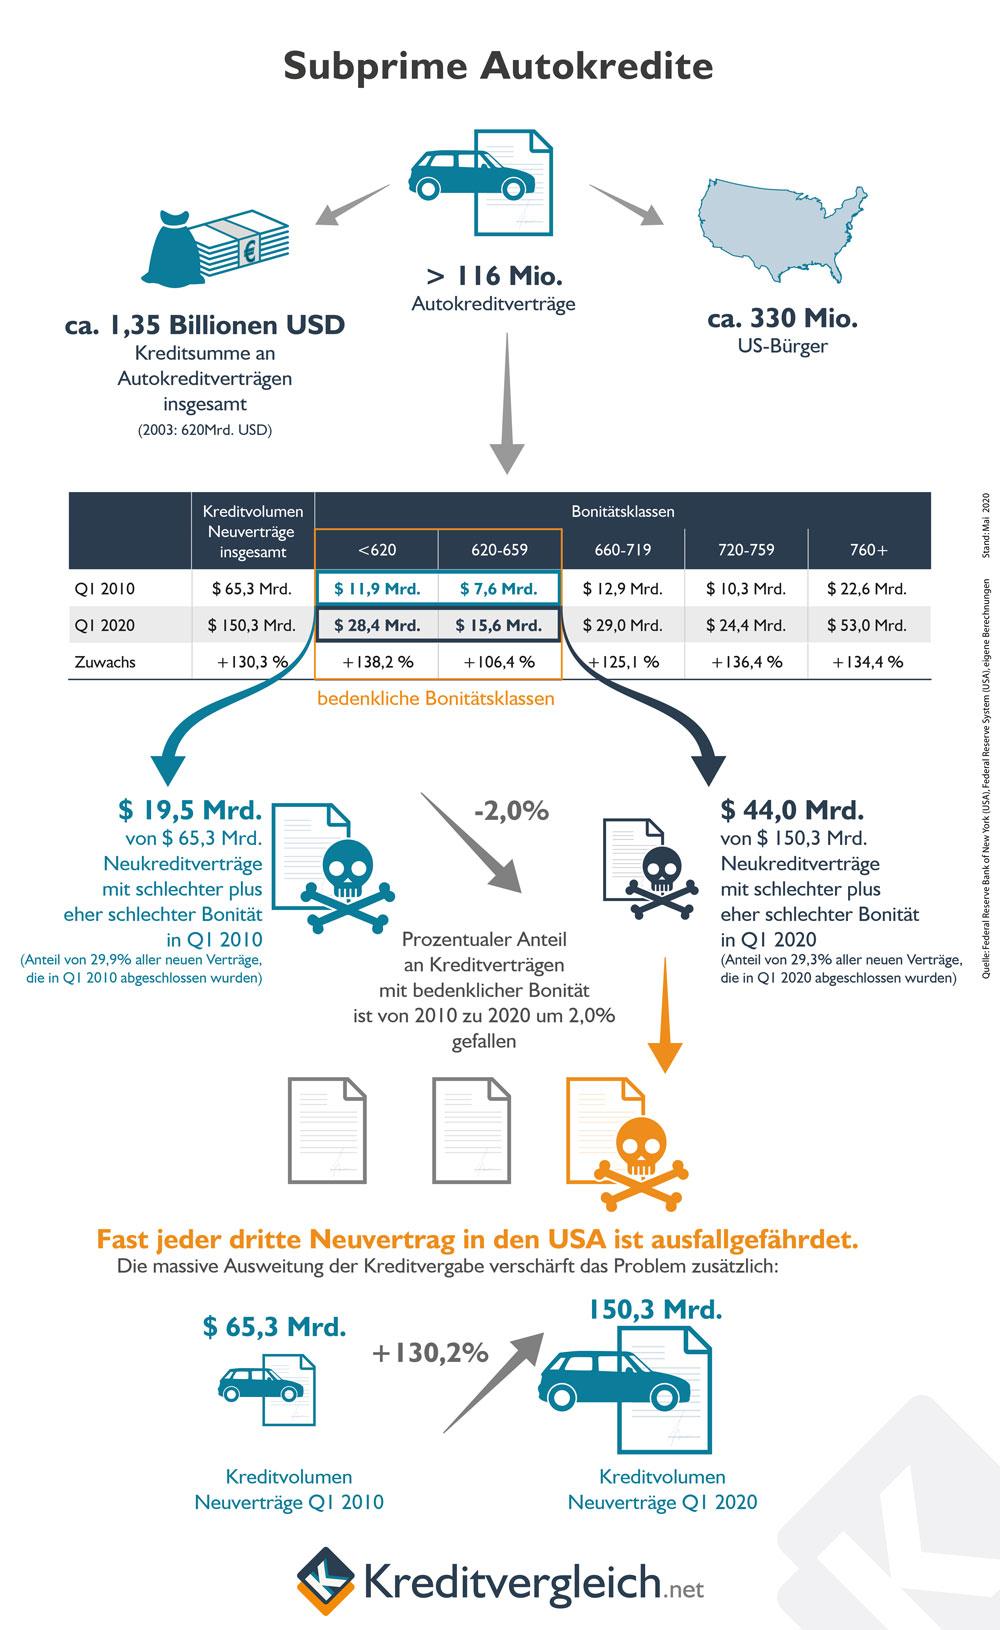 Infografik zu den Subprime Autokrediten in den USA